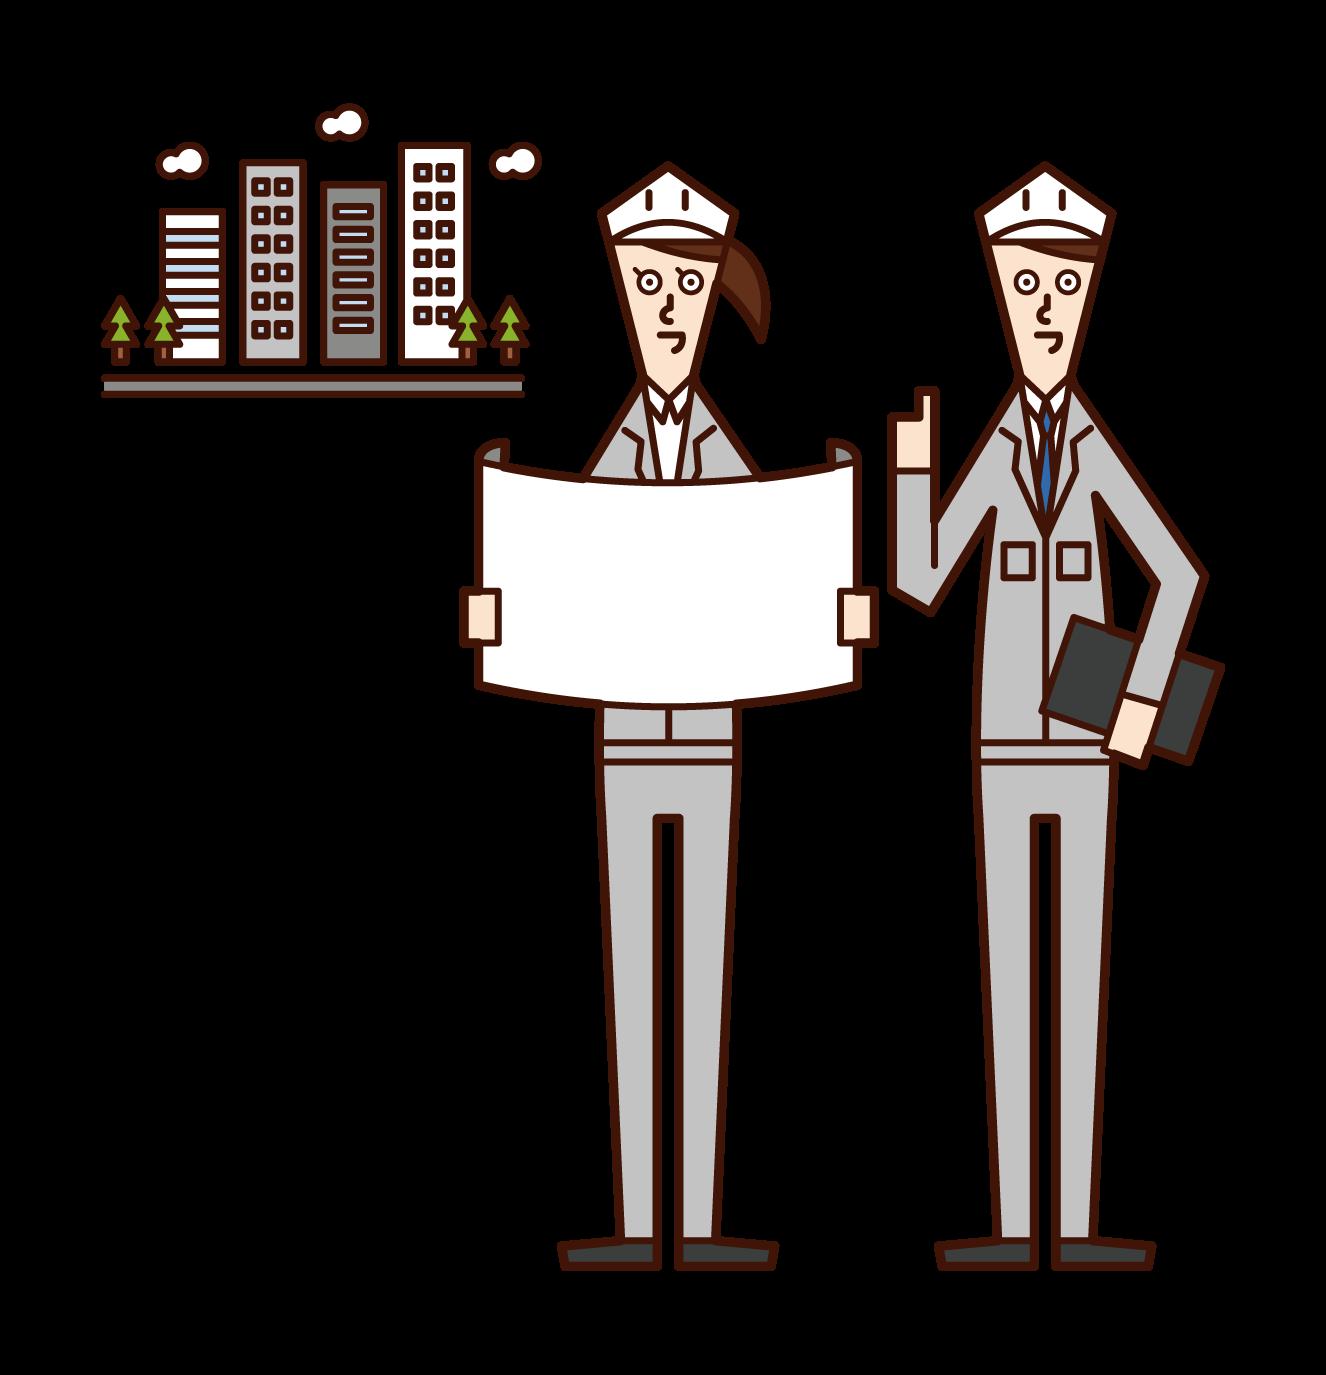 Illustrations of urban developers